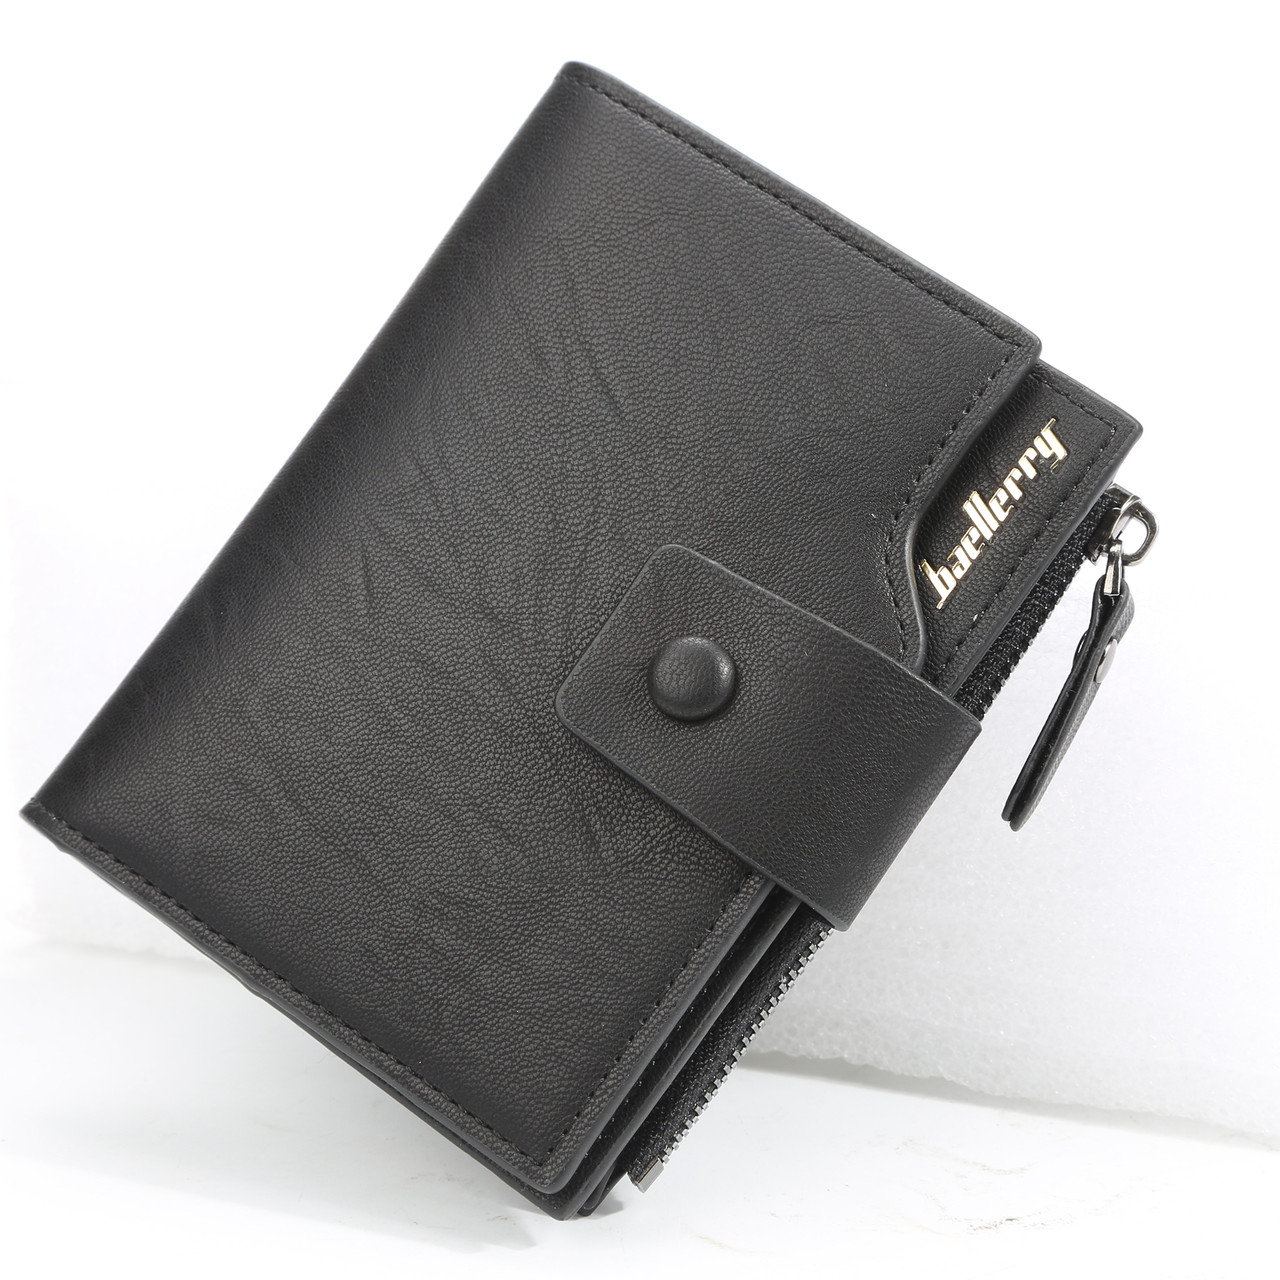 Чоловічий гаманець BAELLERRY Summer Fashion Style портмоне Чорний (SUN4643)